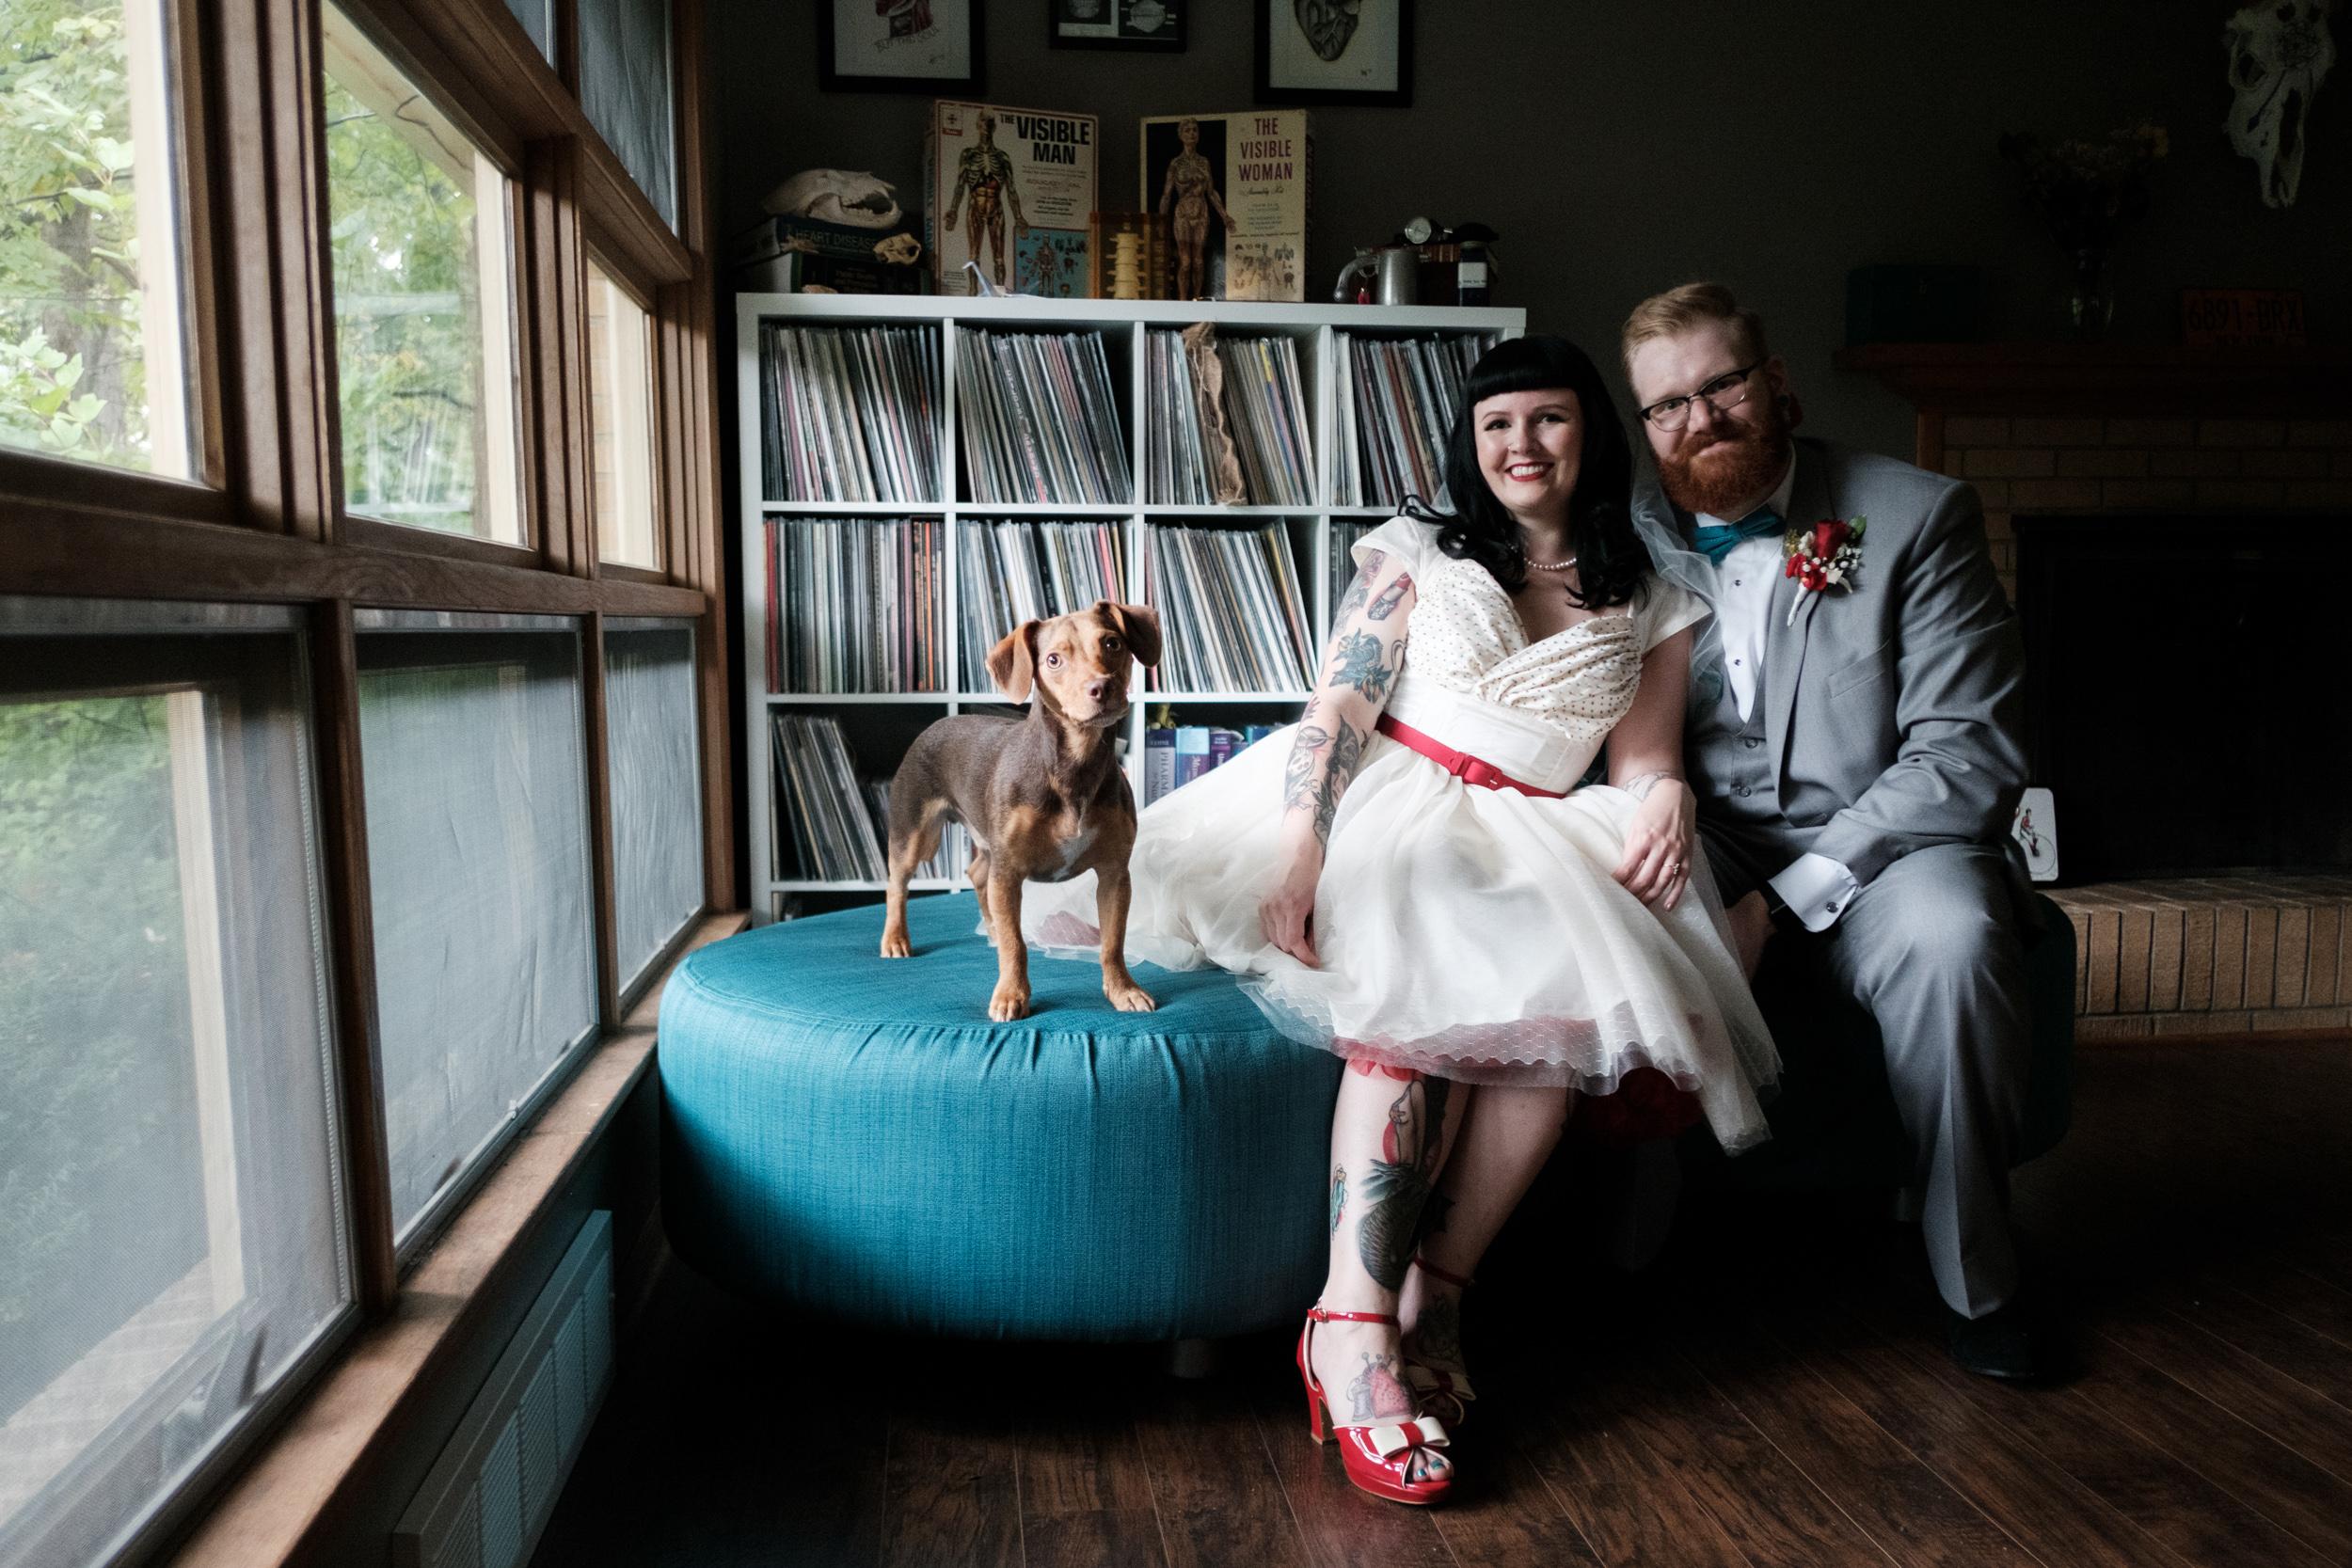 Christian & Sarah wedding photography by Brian milo-208.jpg